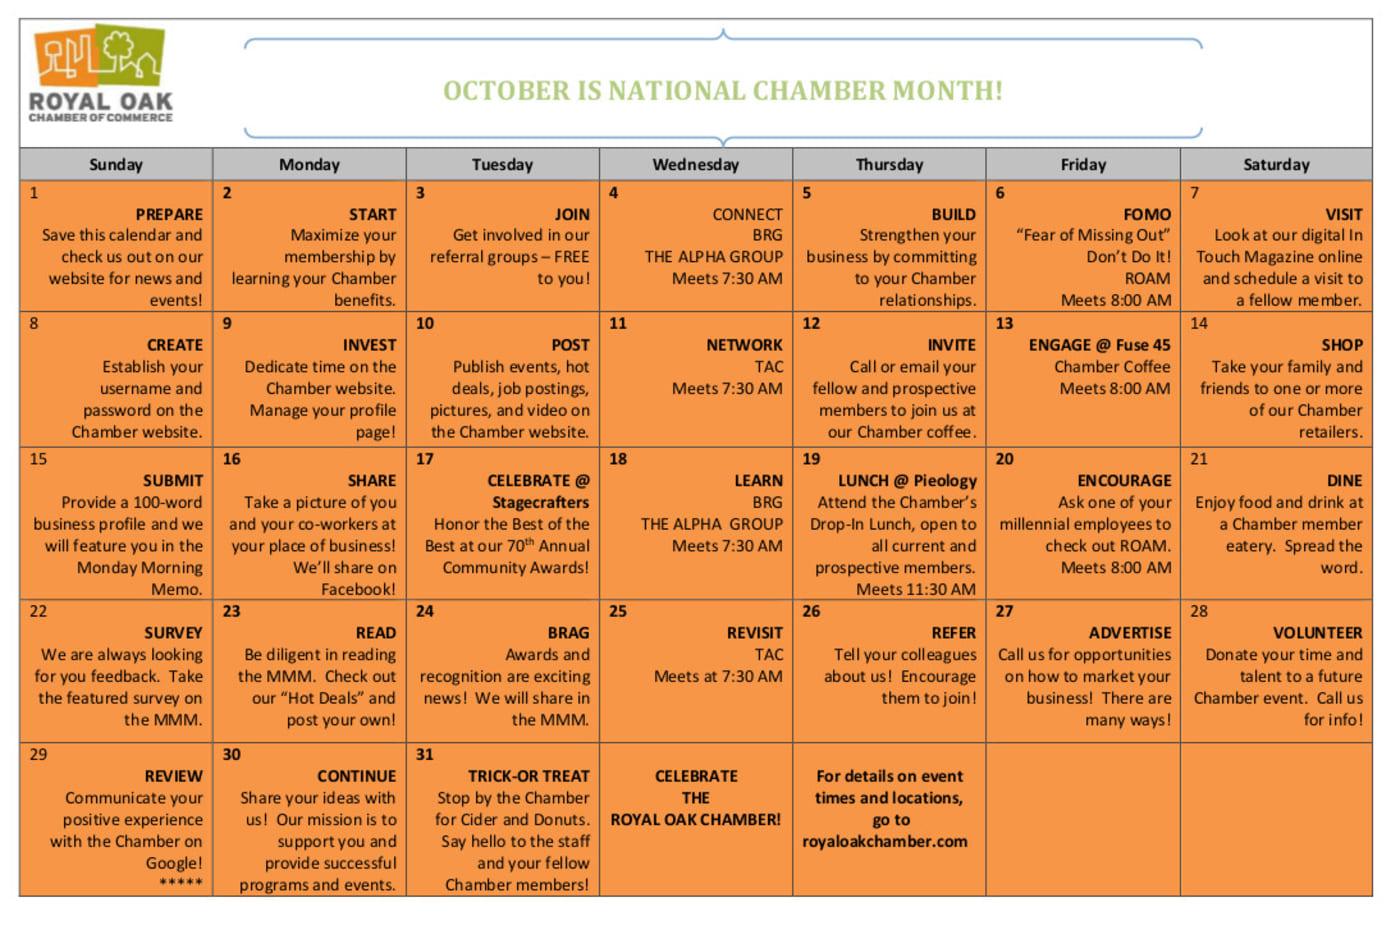 OctoberNatChamber